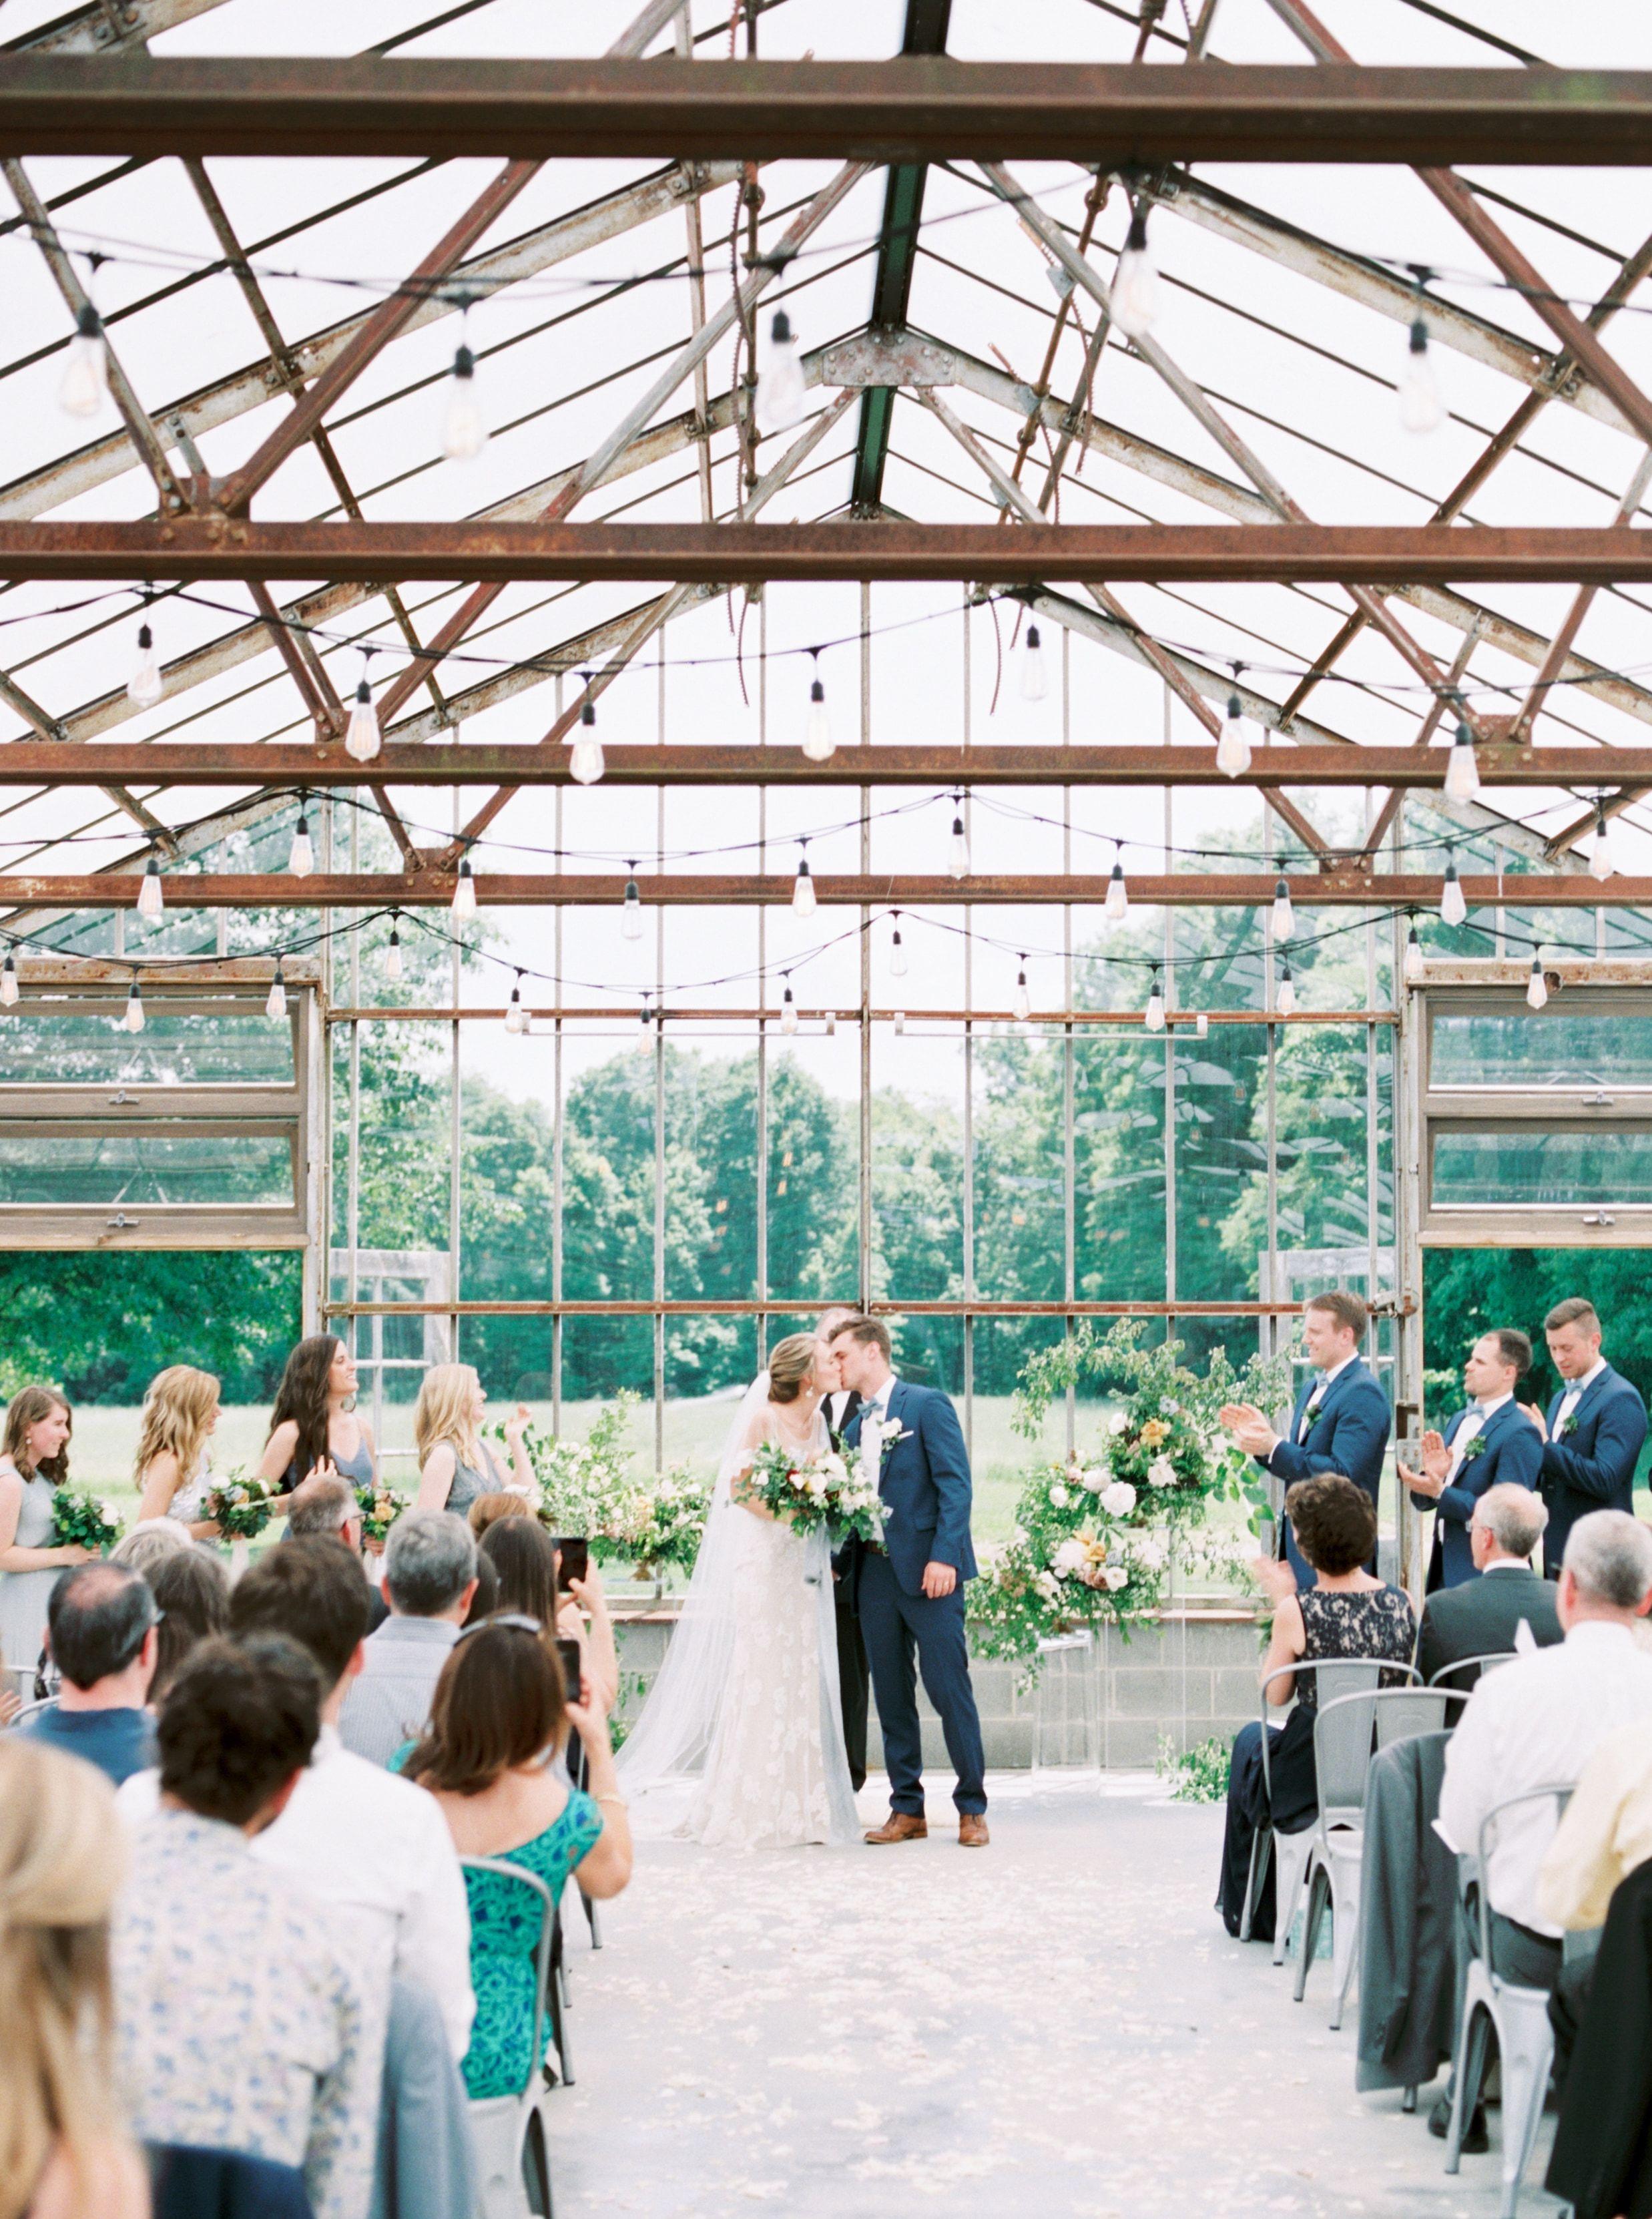 Bride And Groom Greenhouse Wedding Greenhouse Wedding Greenhouse Plans Greenhouse